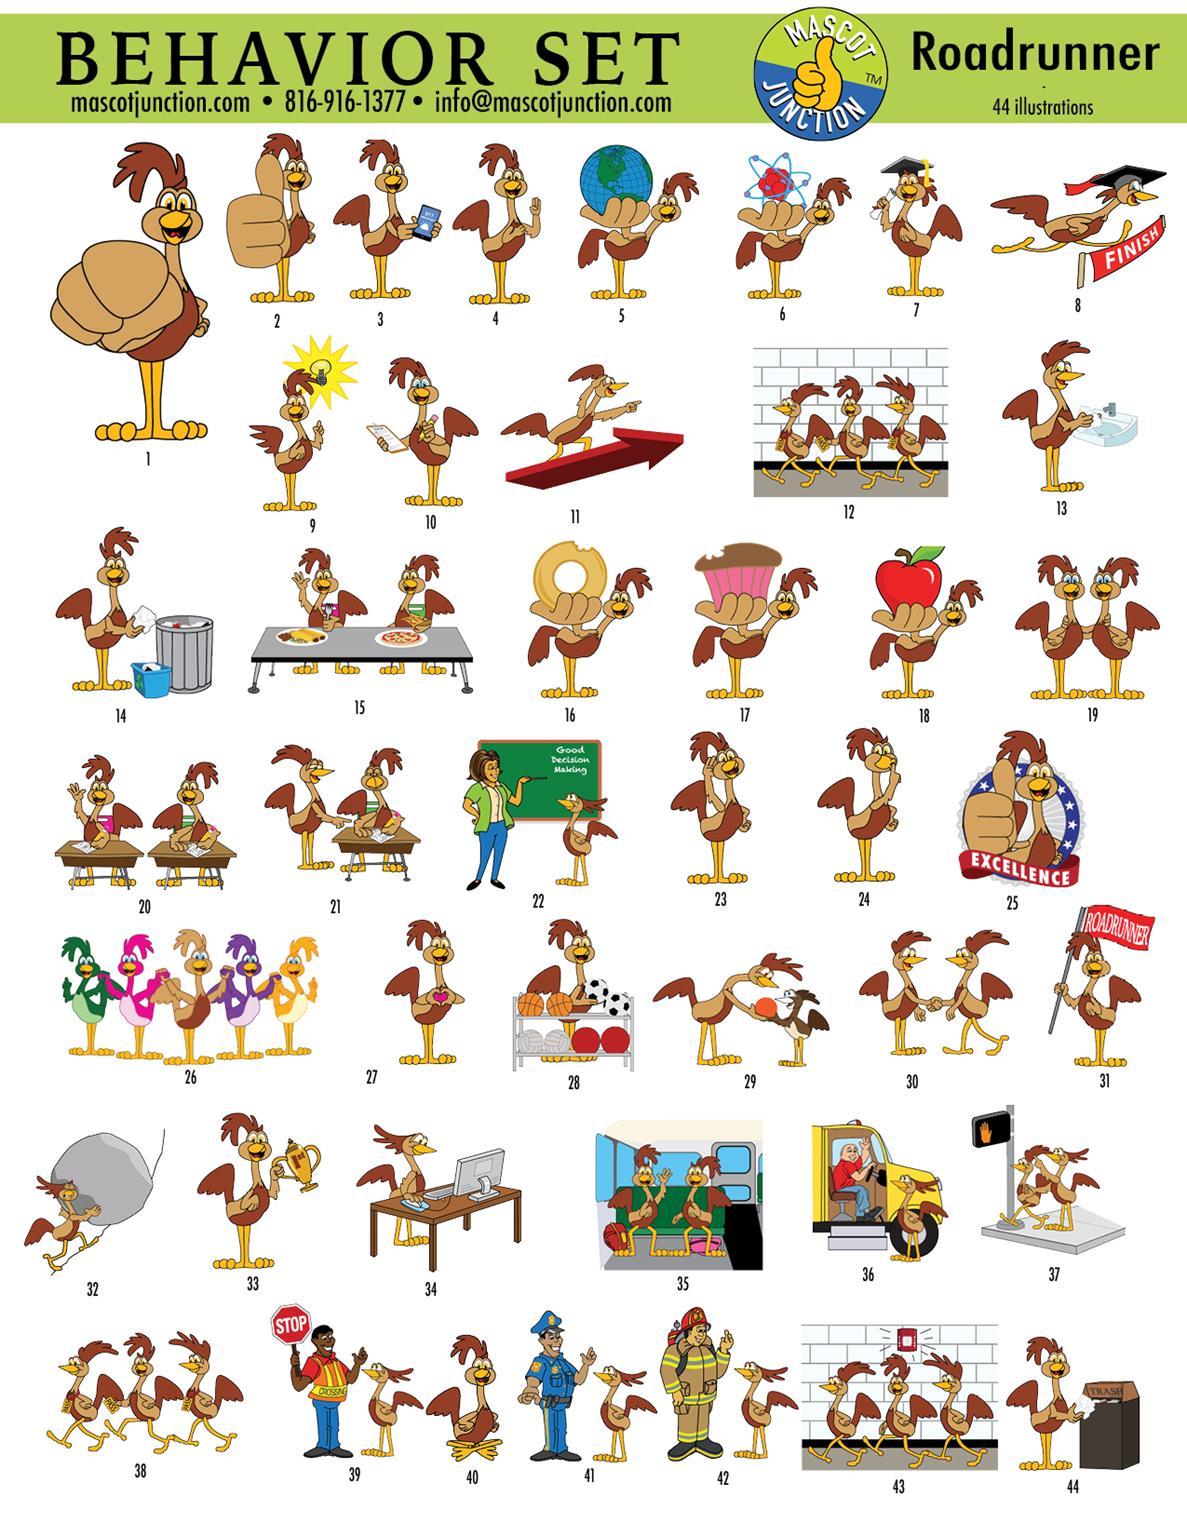 oadrunner Mascot Clip Art PBIS Schools